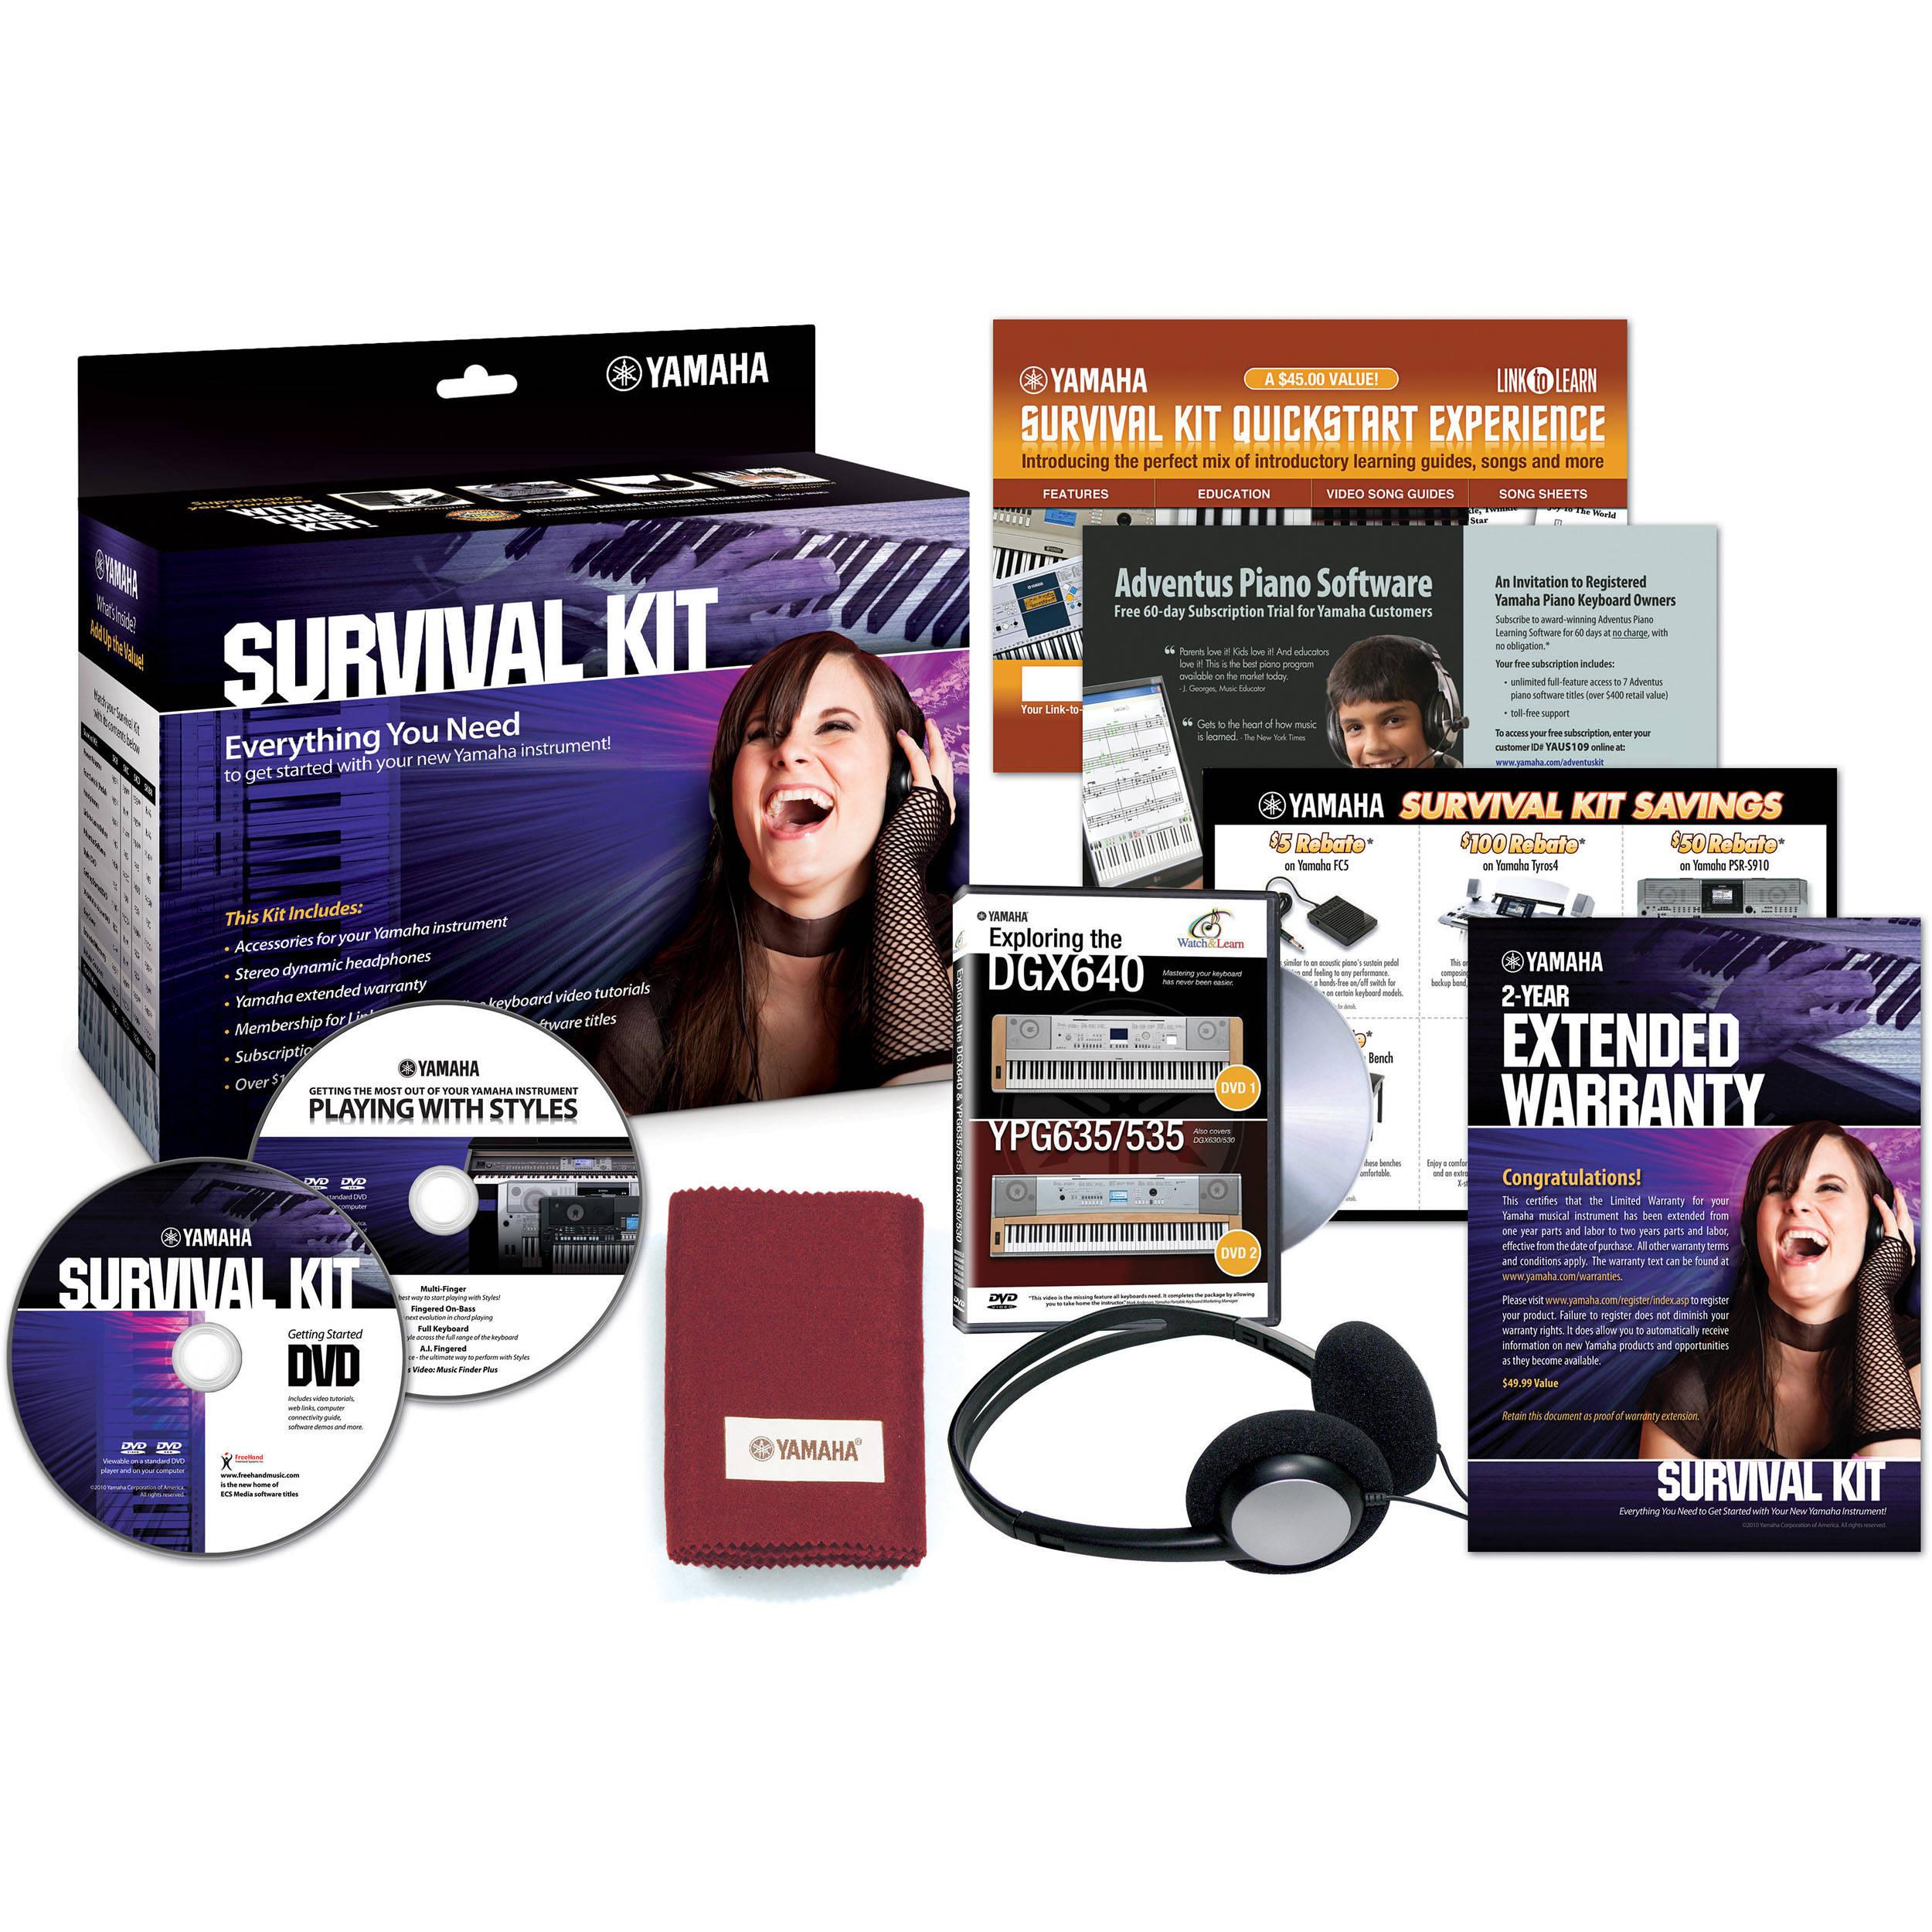 Yamaha Survival Kit Dvd